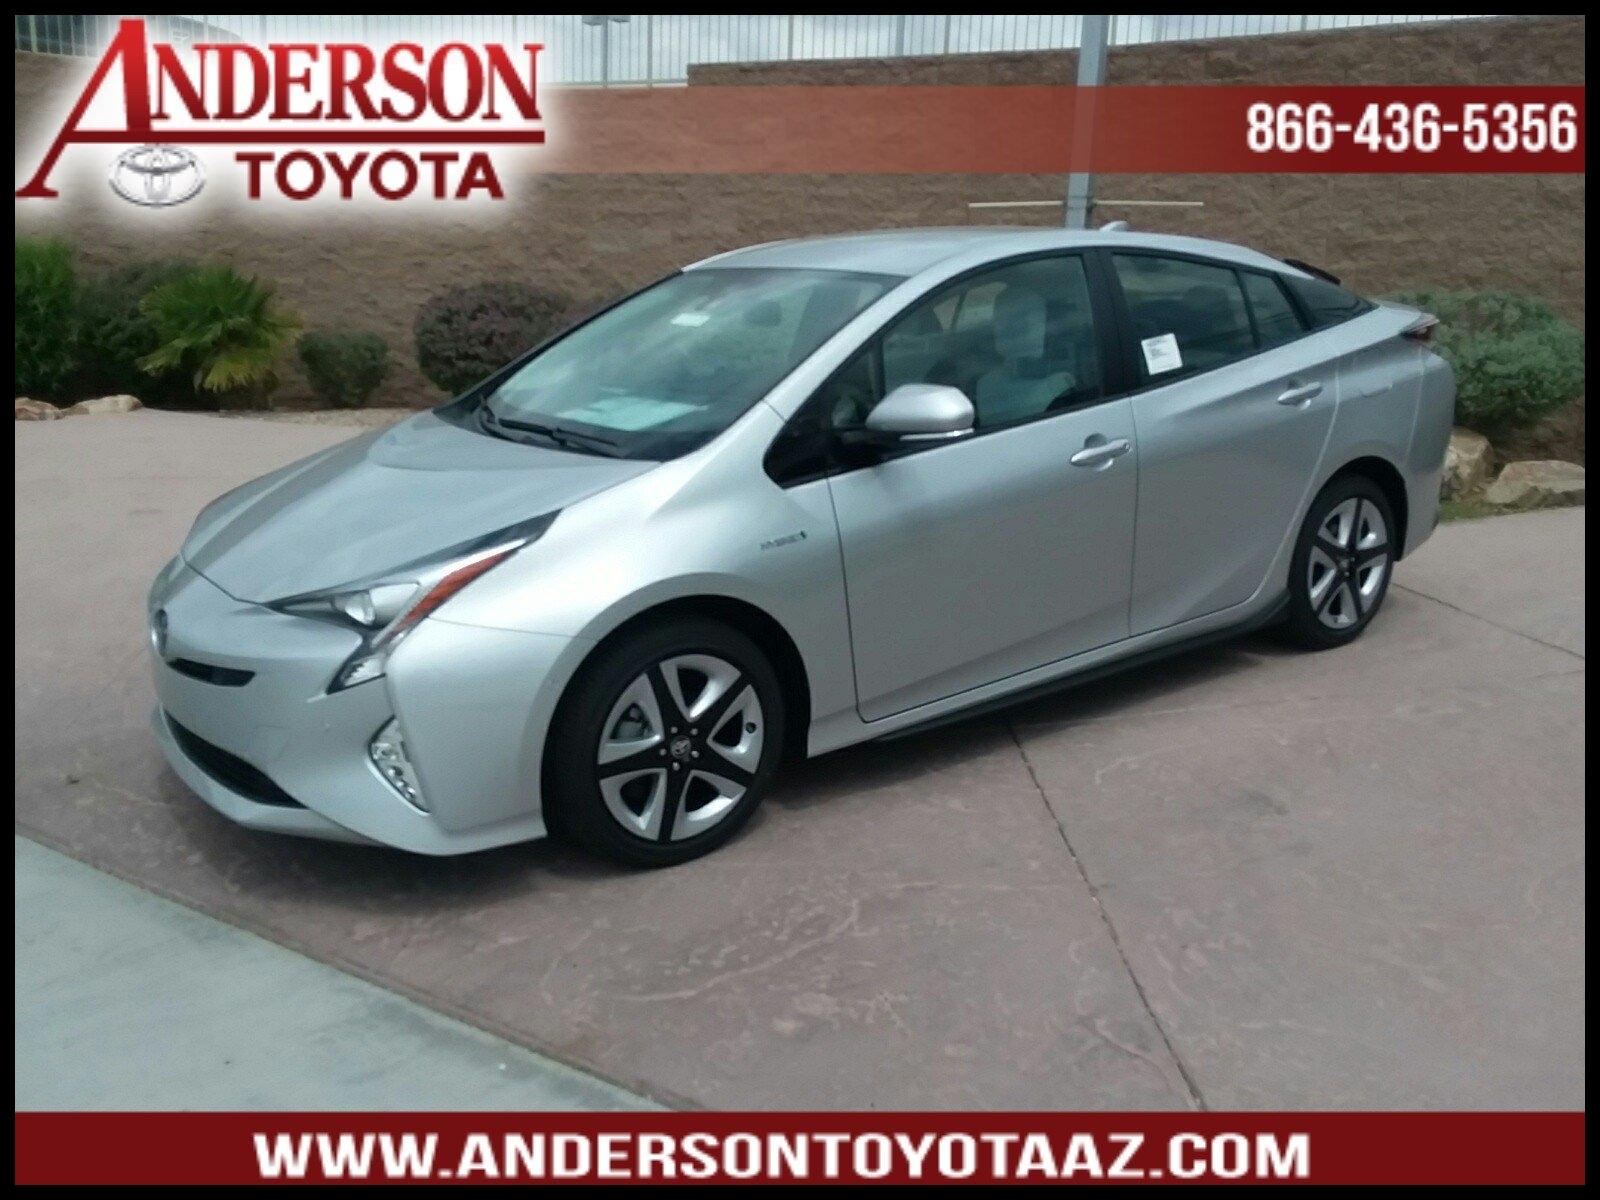 Toyota Dealership Las Vegas The Best Choice Car